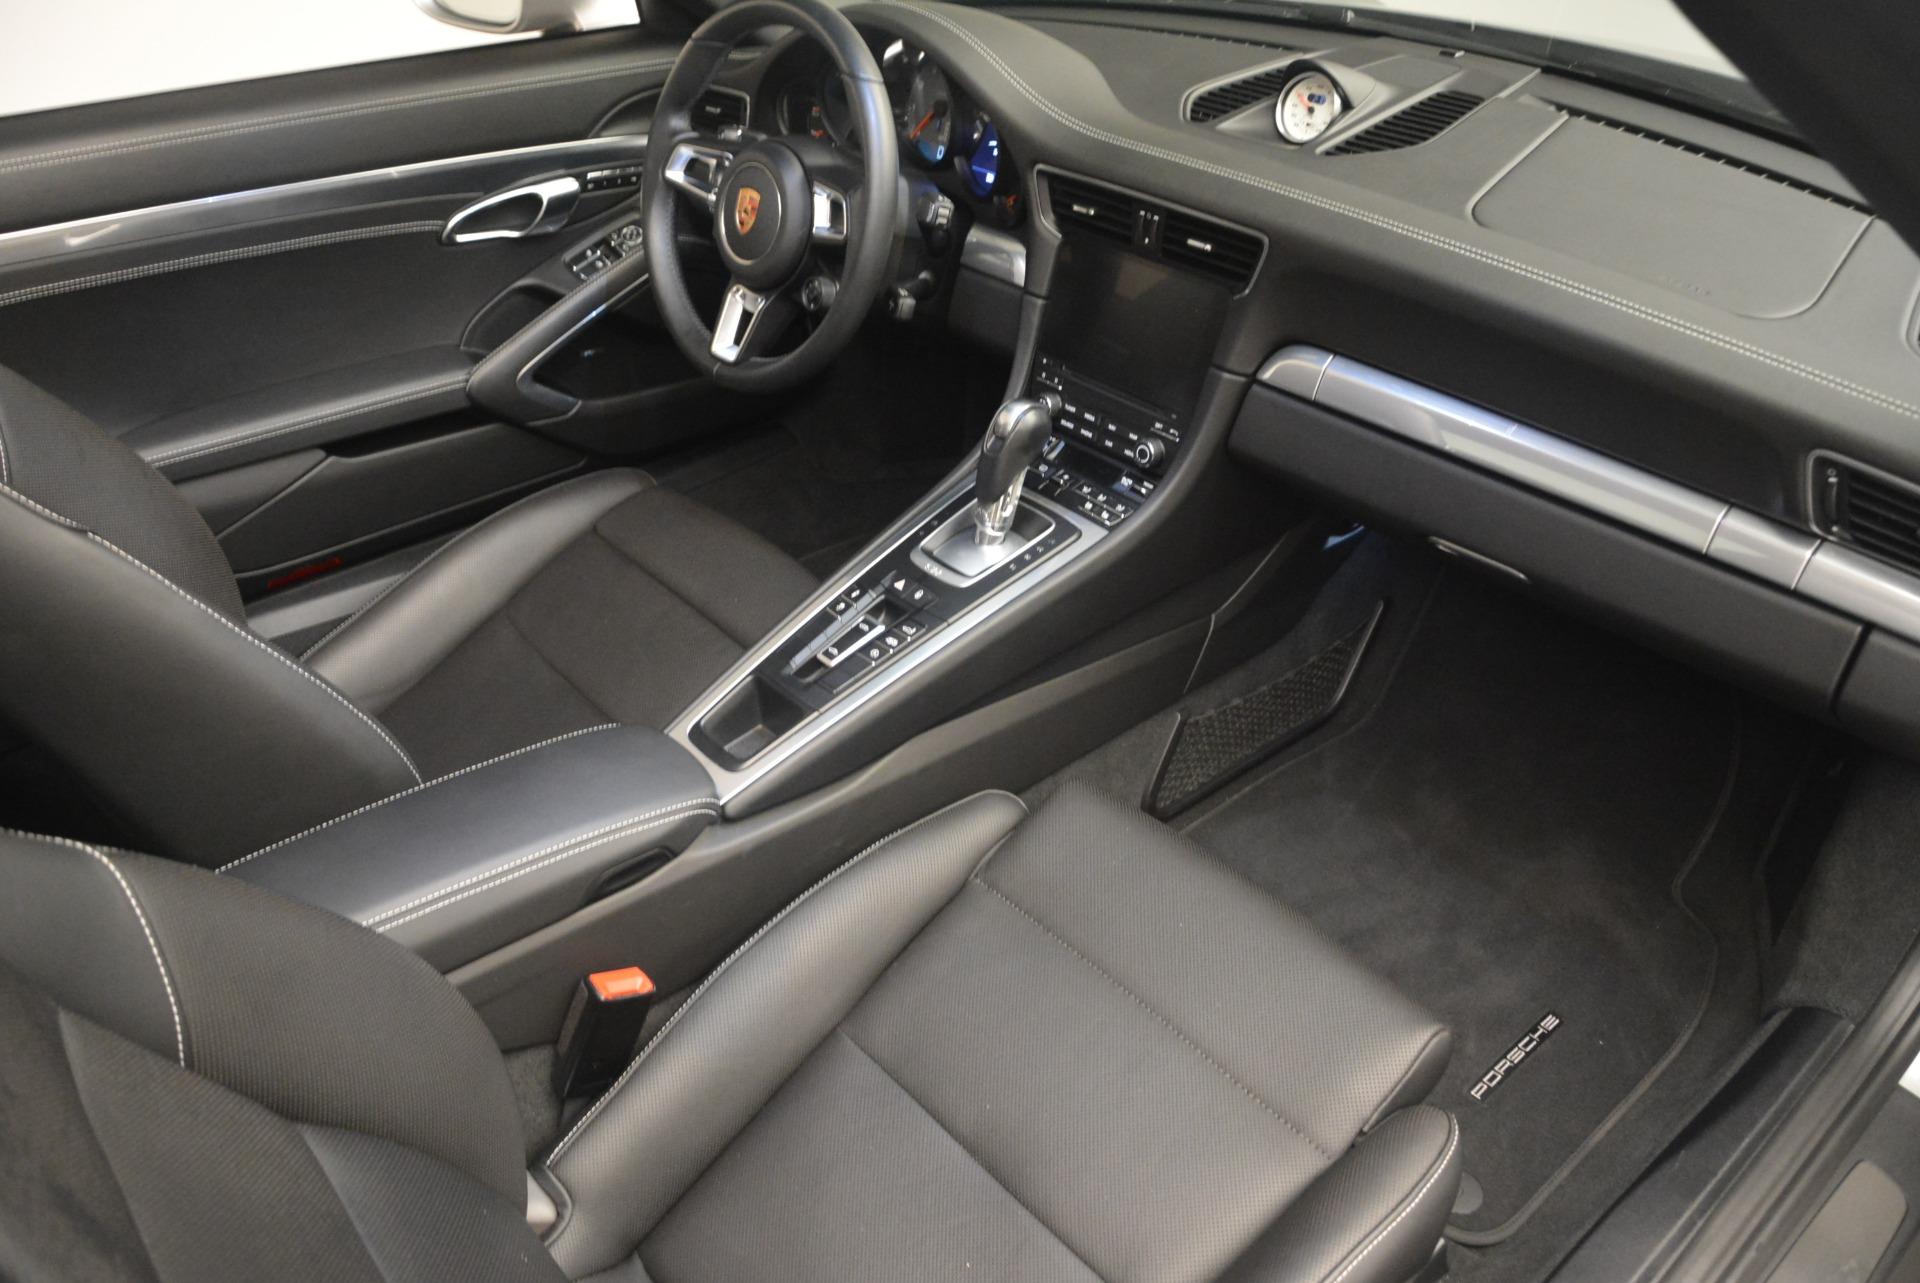 Used 2017 Porsche 911 Targa 4S For Sale 0 In Greenwich, CT